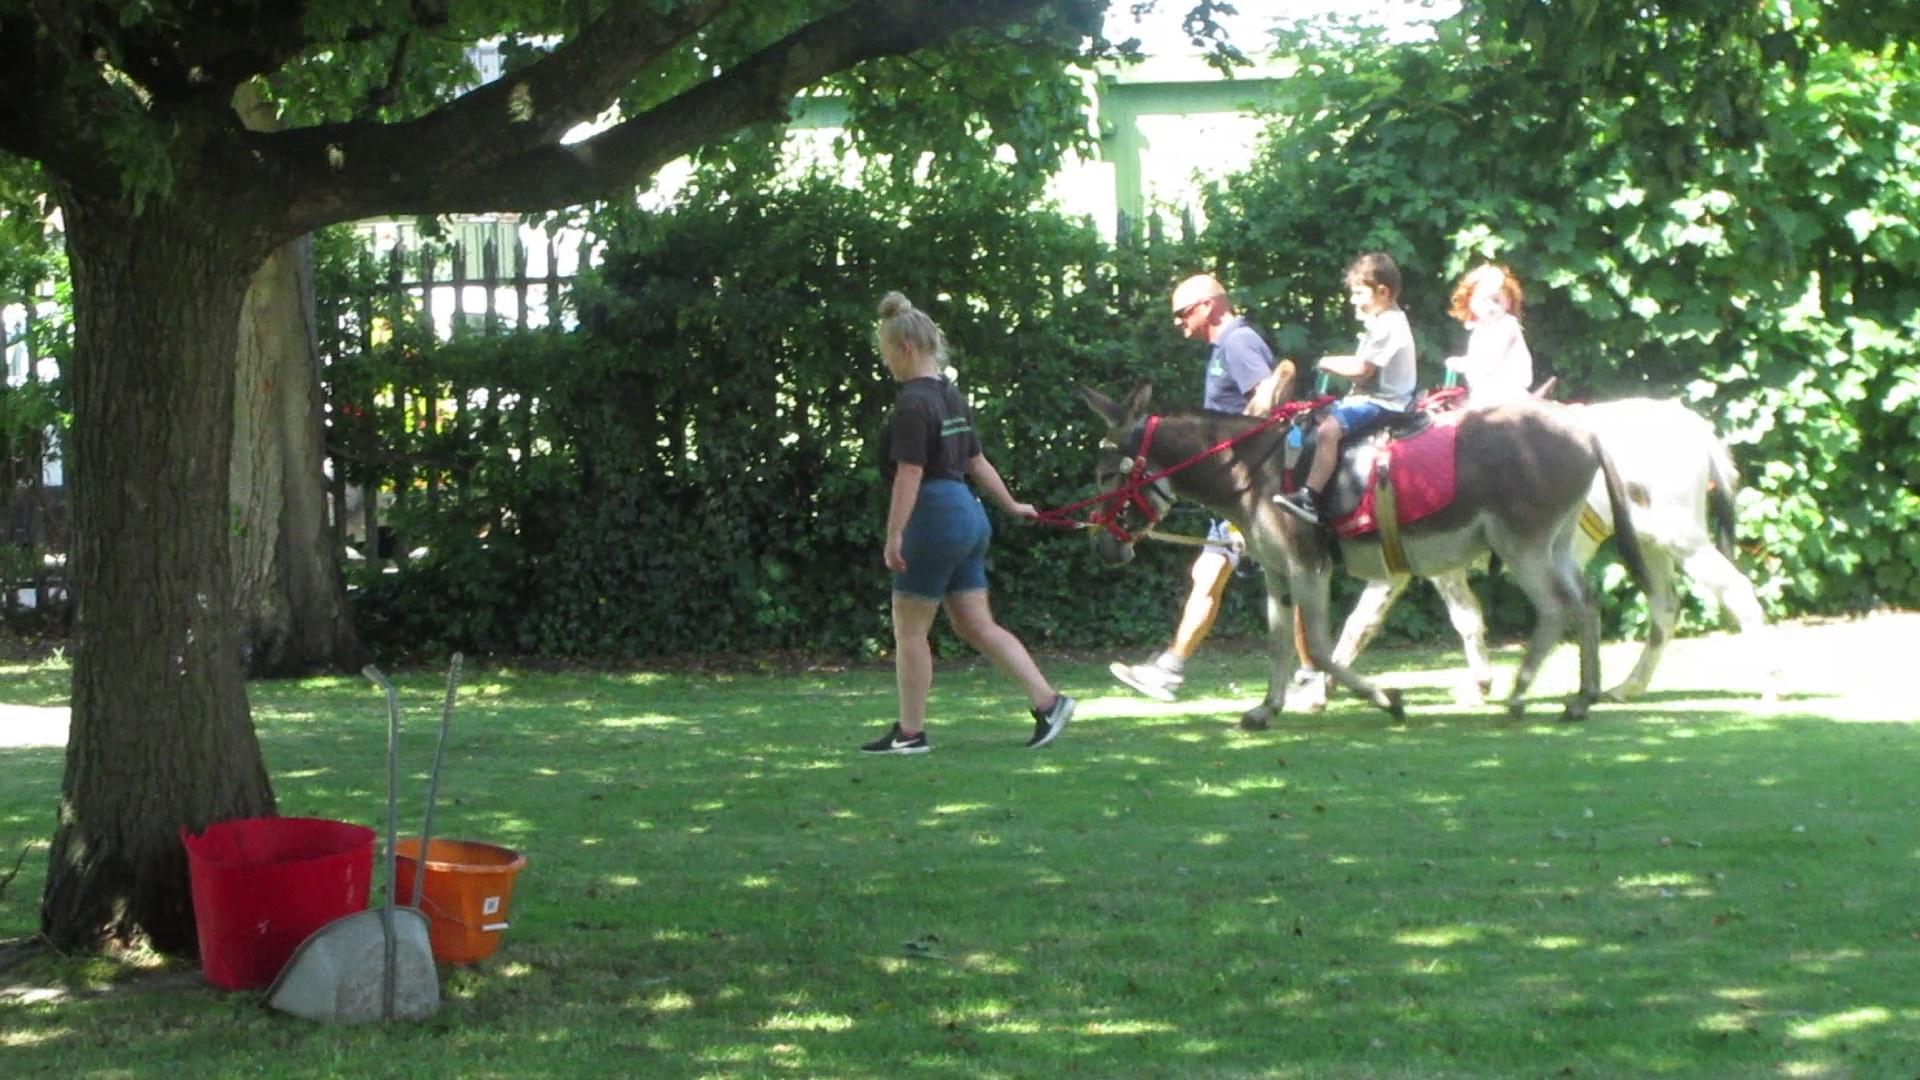 VP094E Rhyl Botanical Gardens Fun Day 2018 - 08.jpg